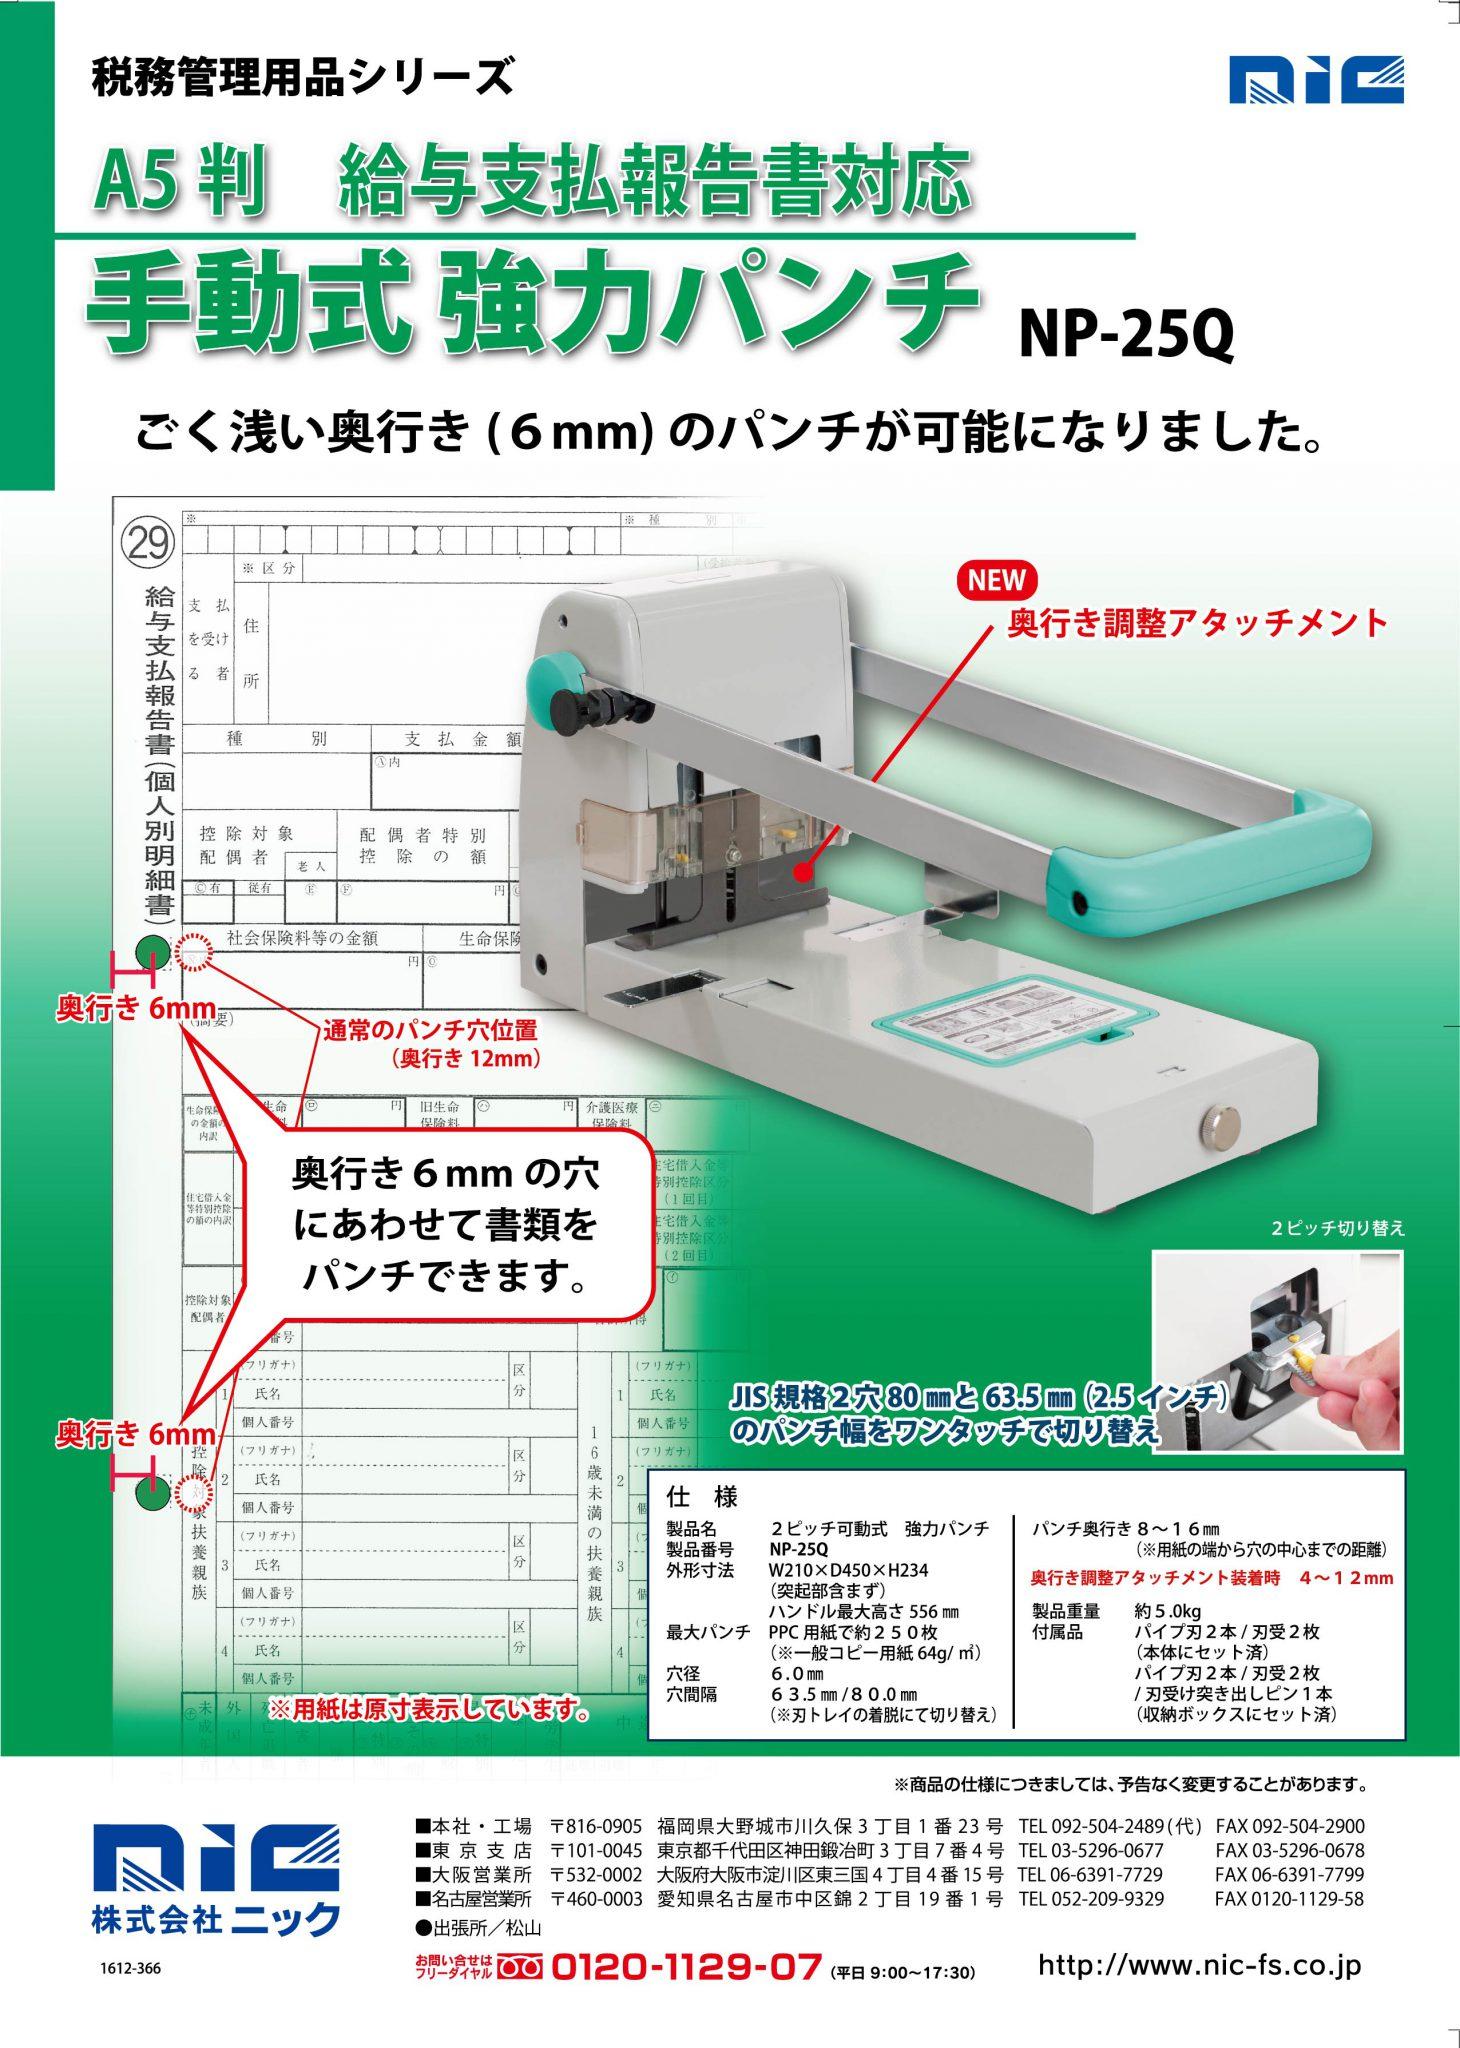 【A5判 給与支払報告書対応】 手動式 強力パンチ